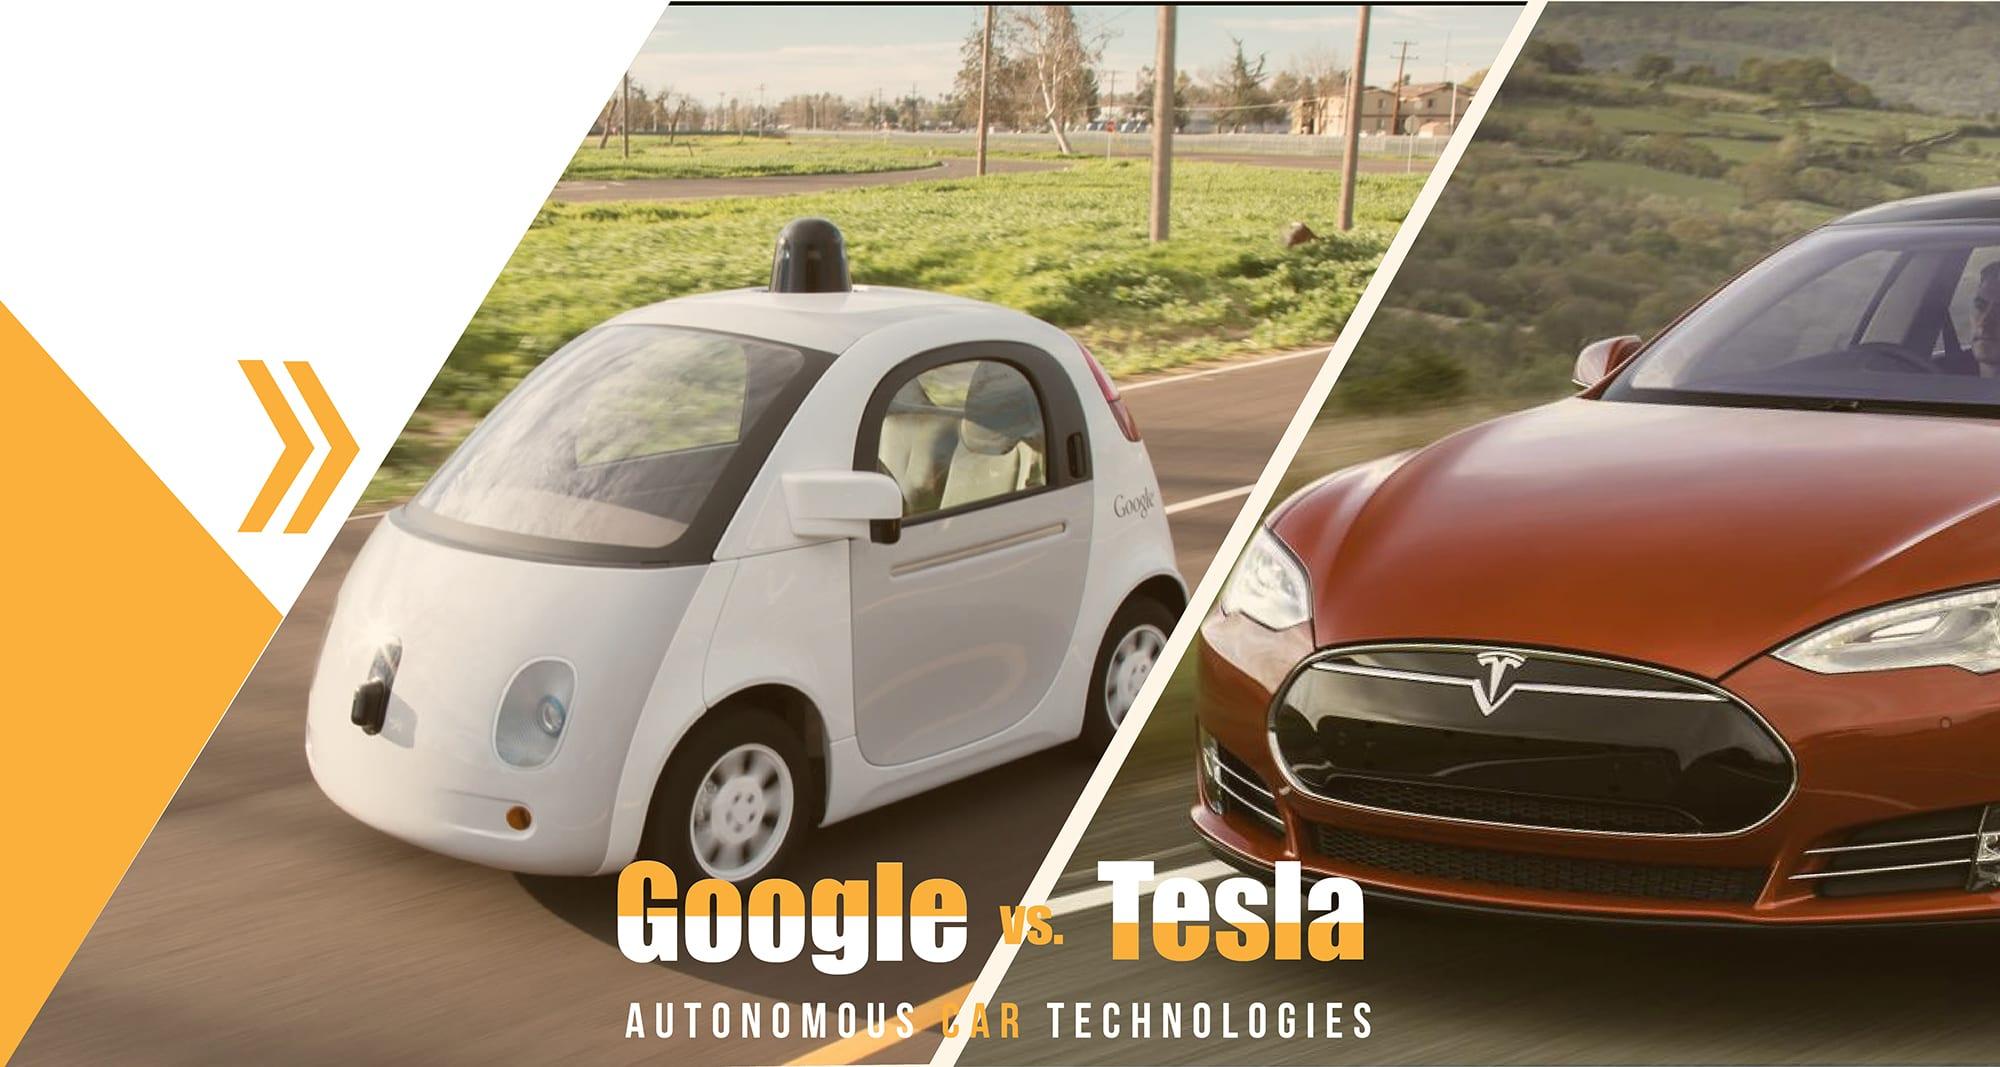 How Tesla and Google's autonomous car technologies are